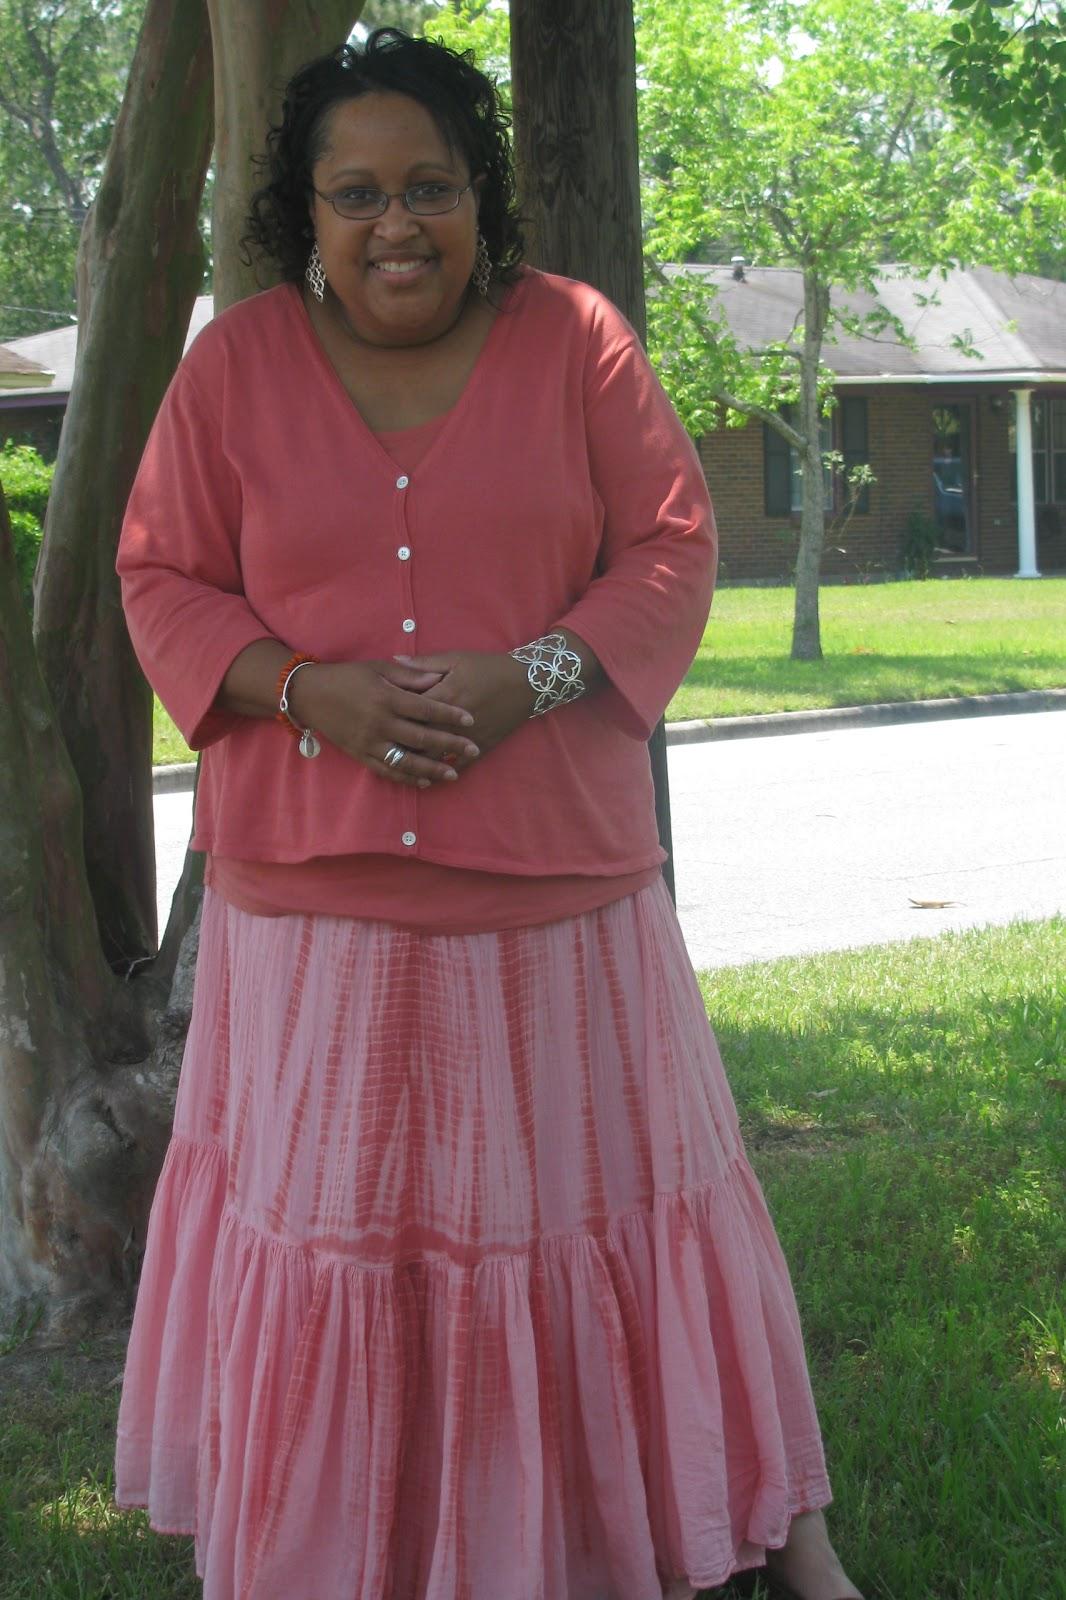 http://4.bp.blogspot.com/-IKwsMD9Vgno/TccjT3I2paI/AAAAAAAABAE/kj6RbuRR8iw/s1600/MothersDay2011+13.JPG